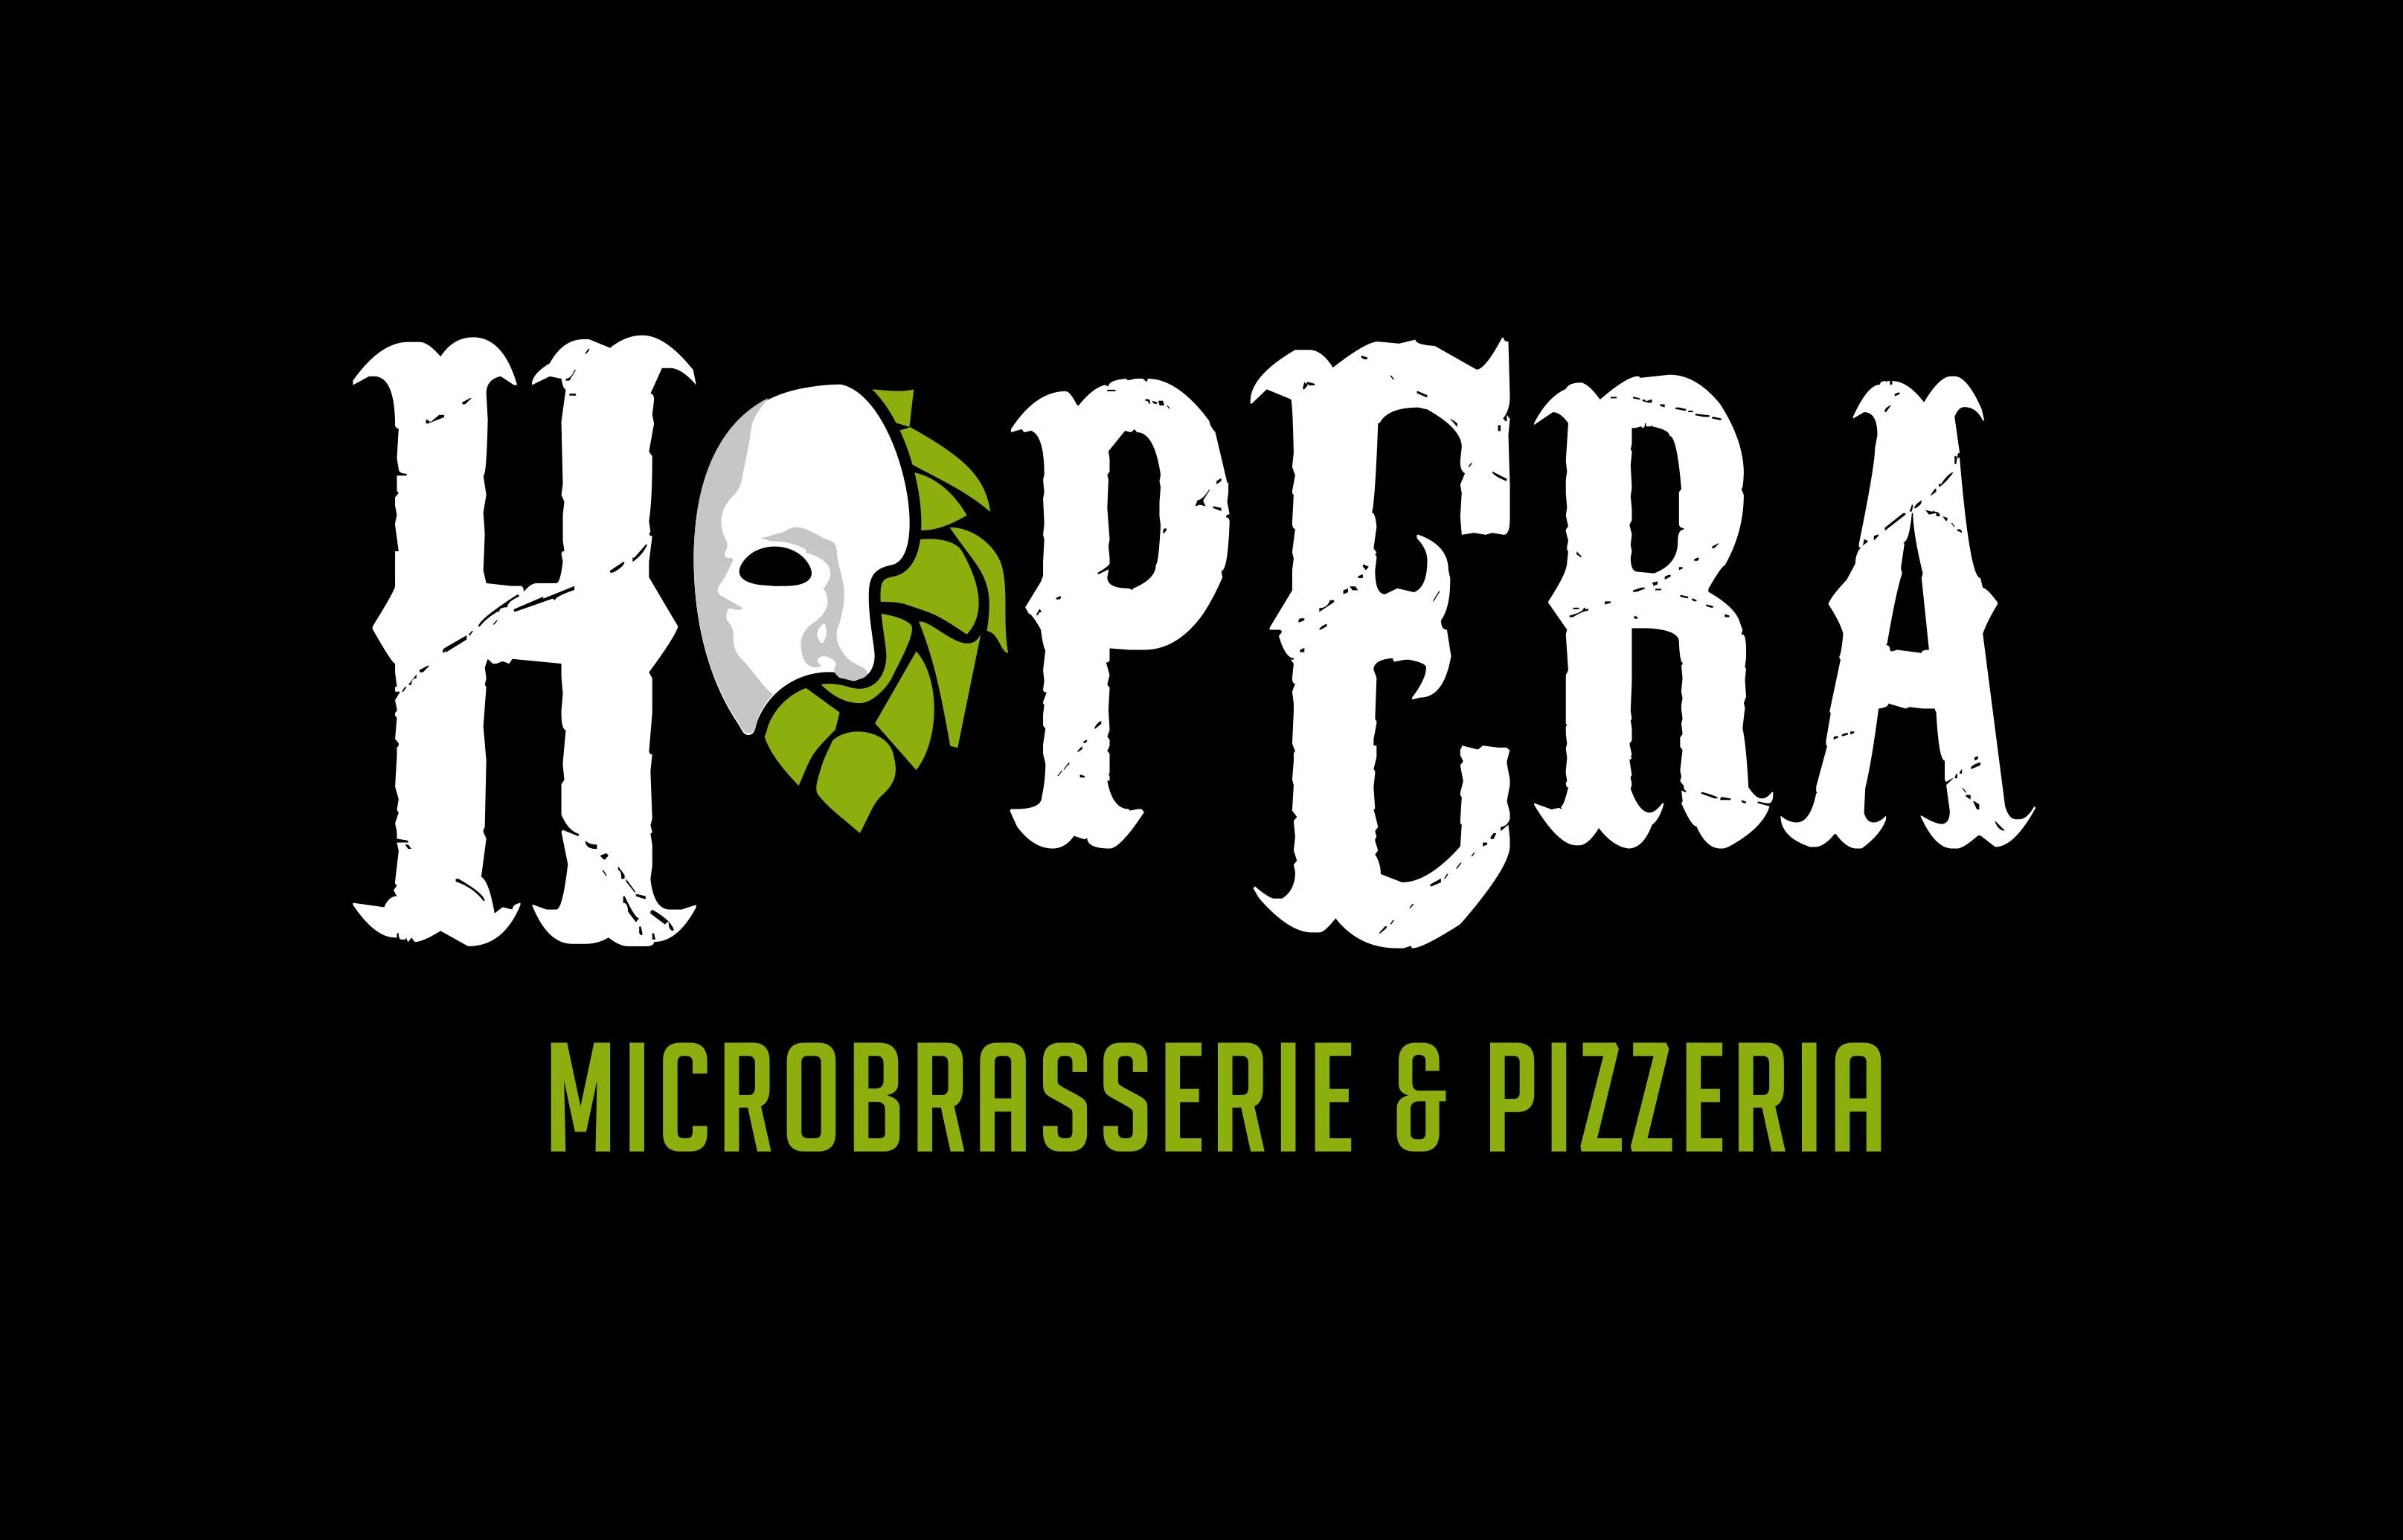 HopEra Microbrasserie & Pizzeria